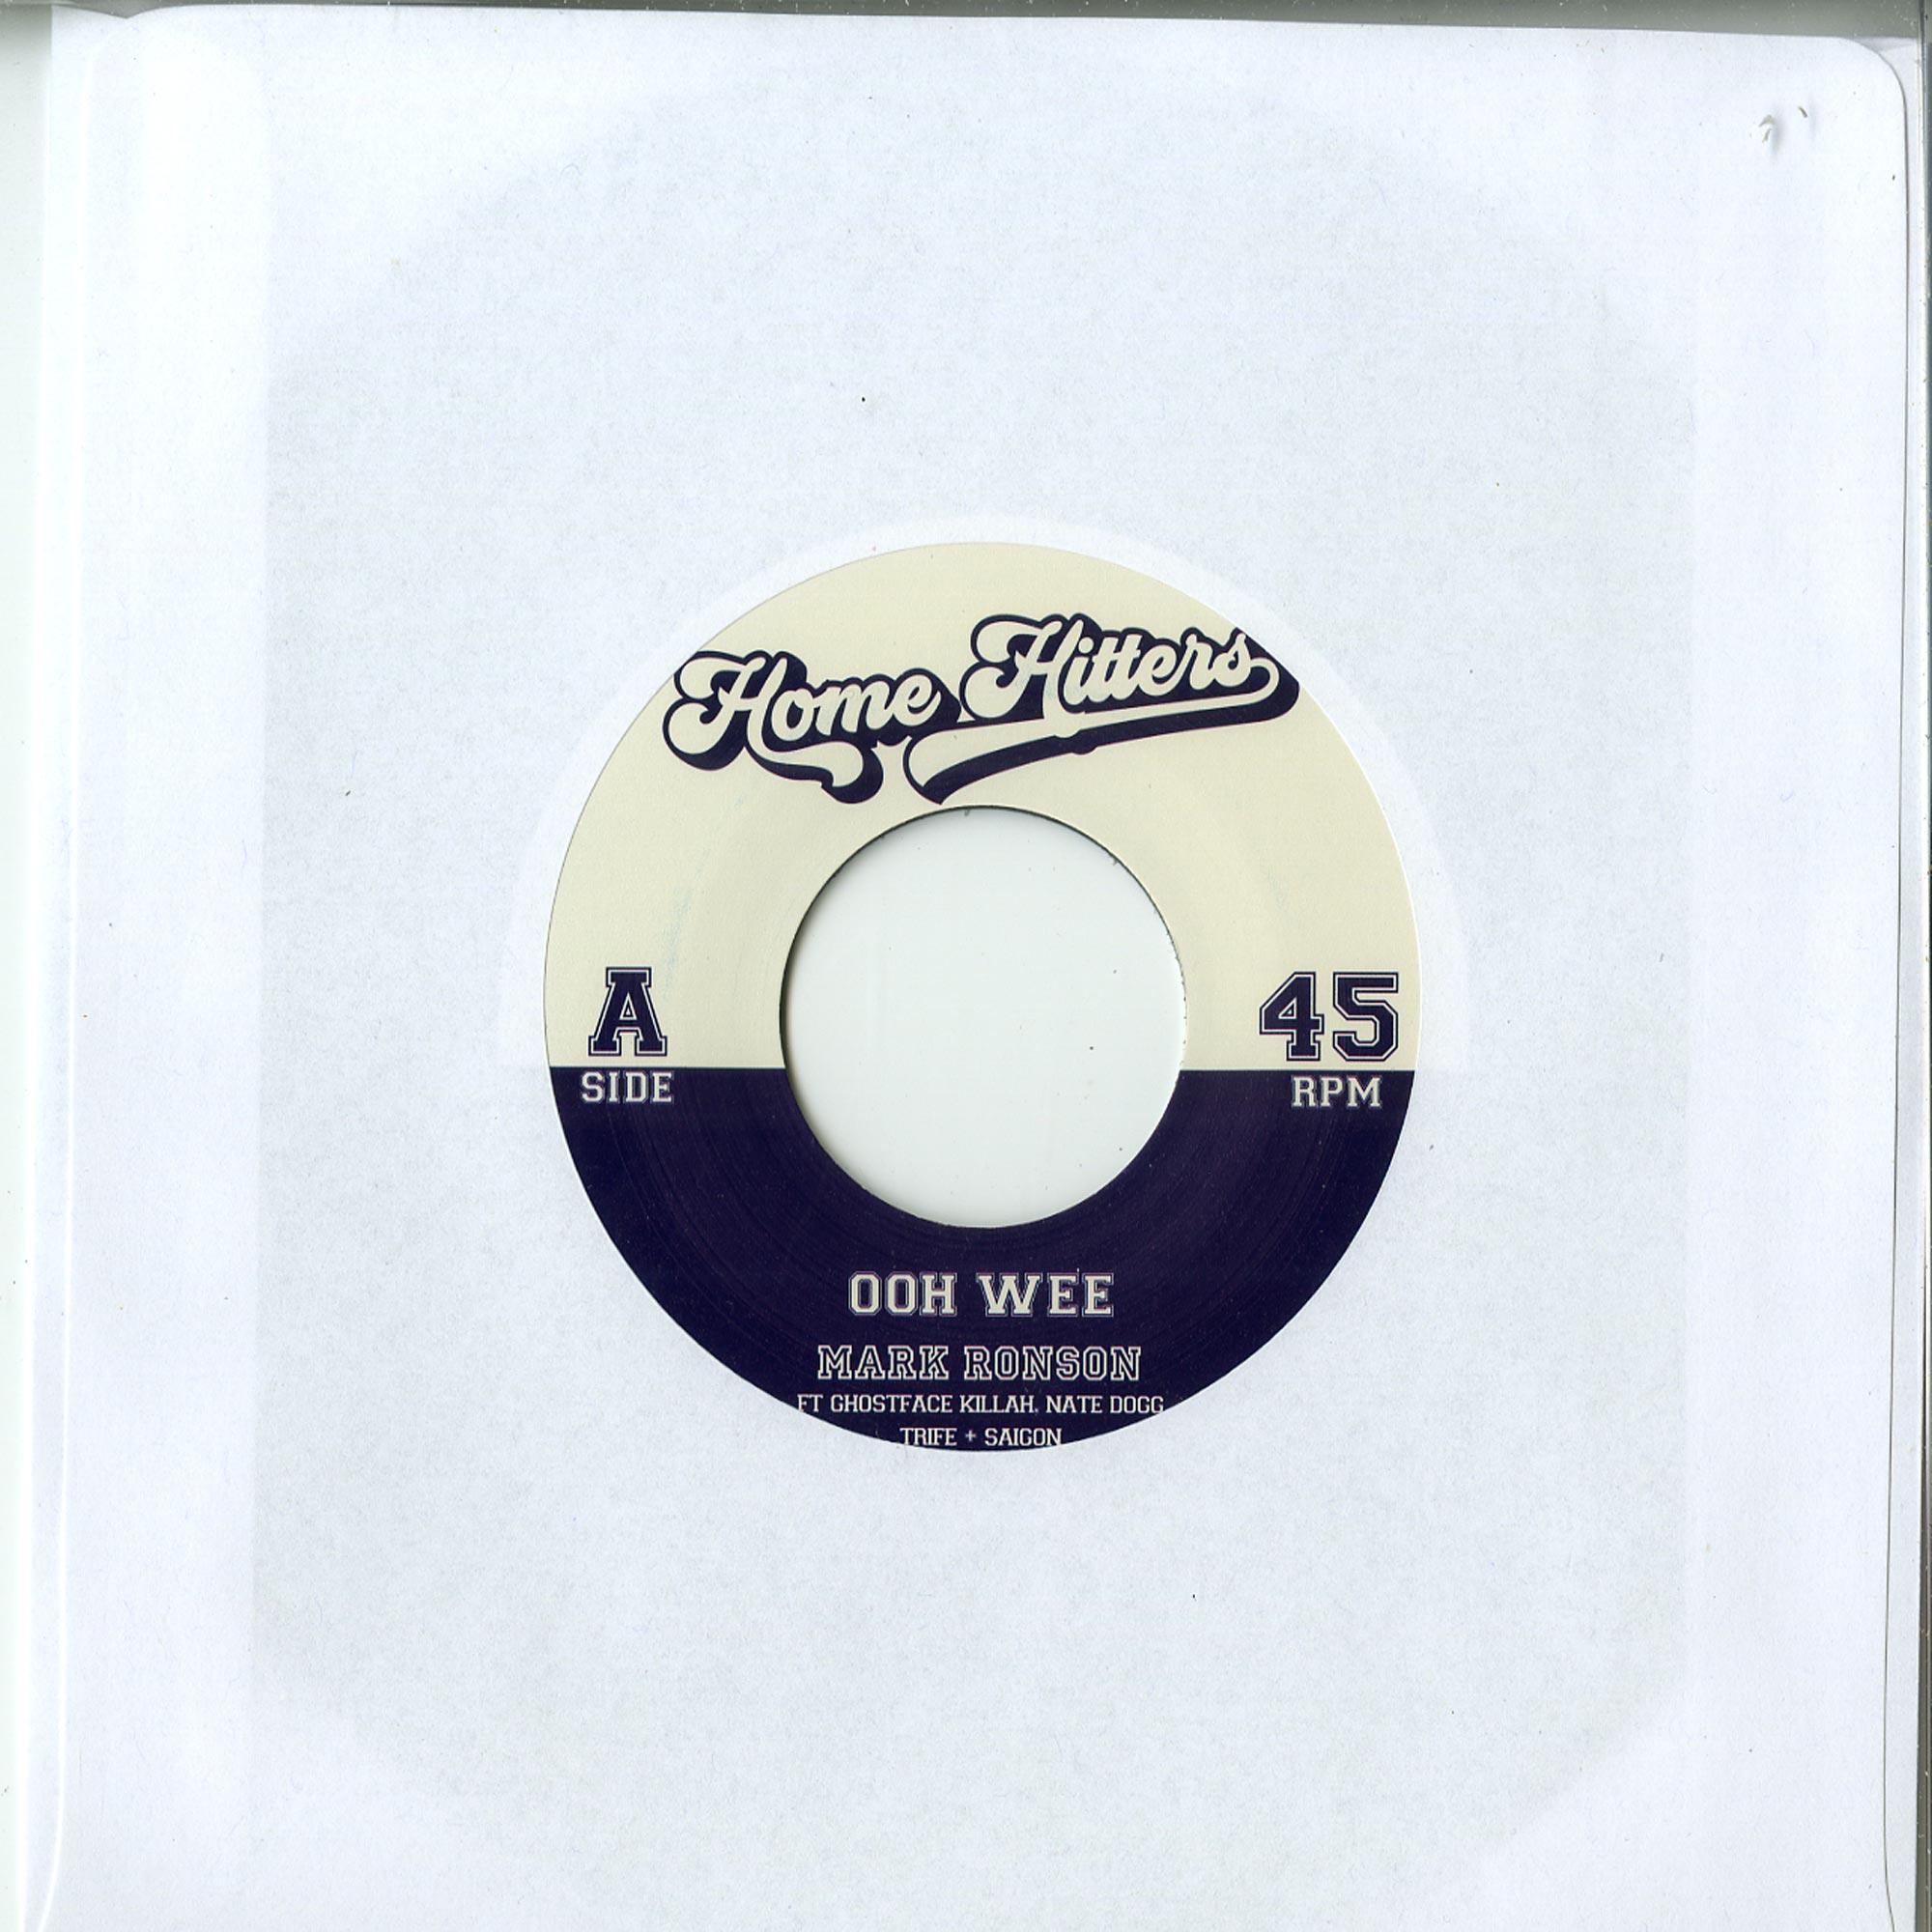 Mark Ronson / Missy Elliott - OOH WEE / WORK IT